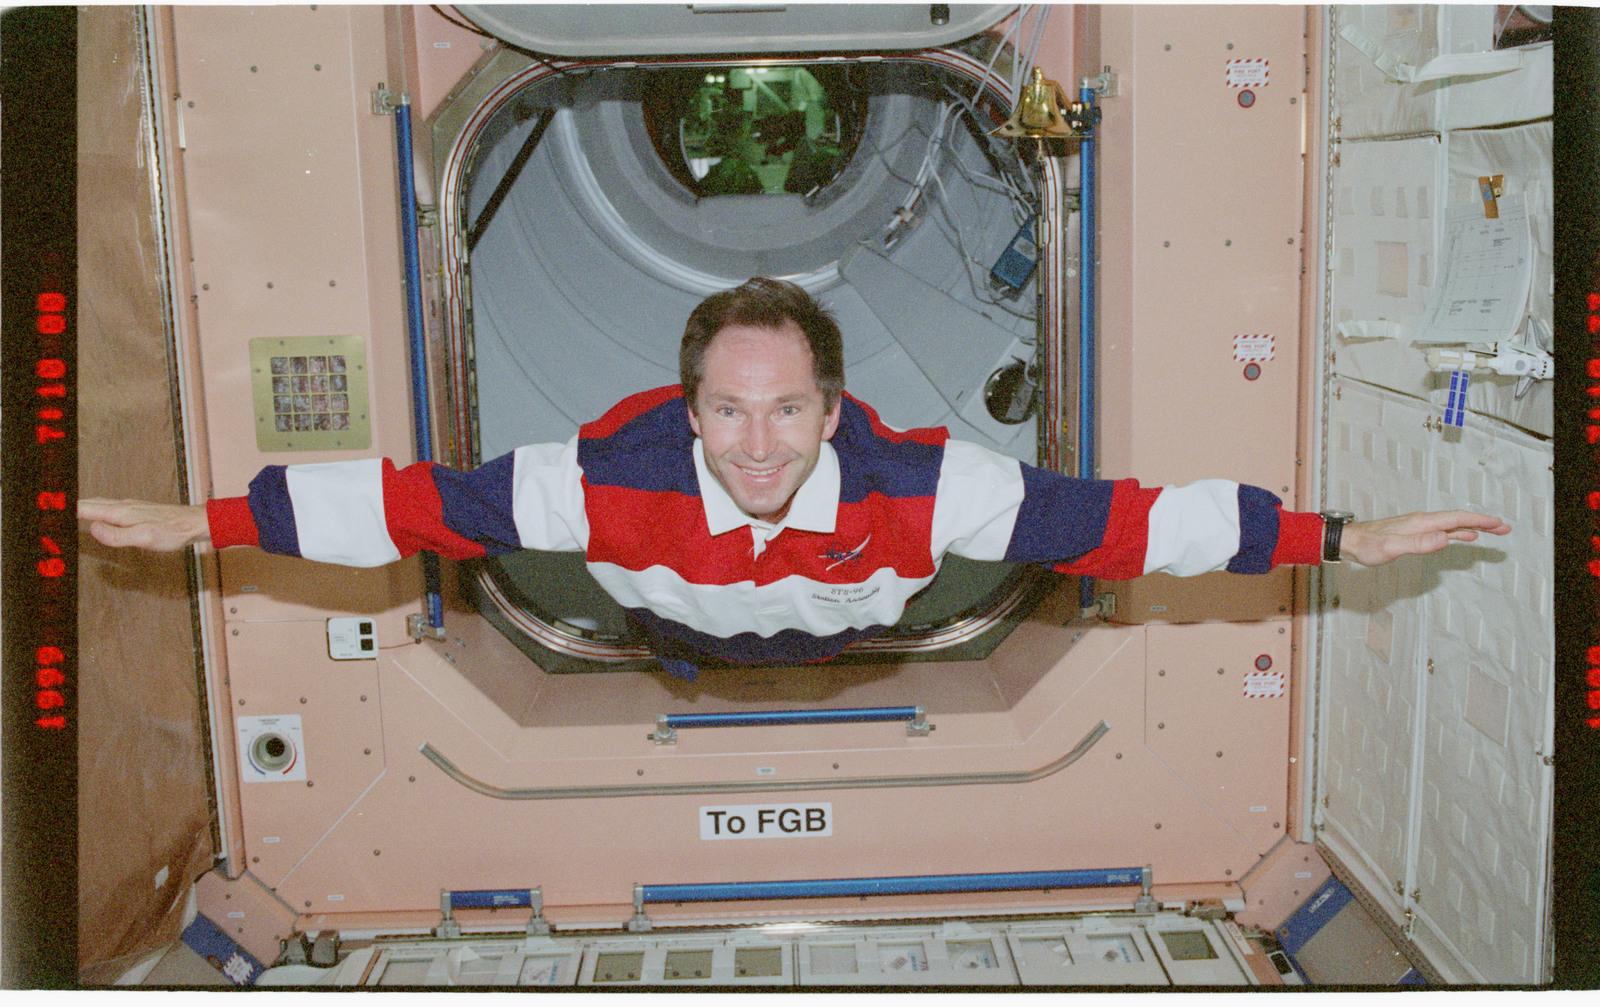 STS096-379-008 - STS-096 - MS Tokarev flys through Node 1/Unity